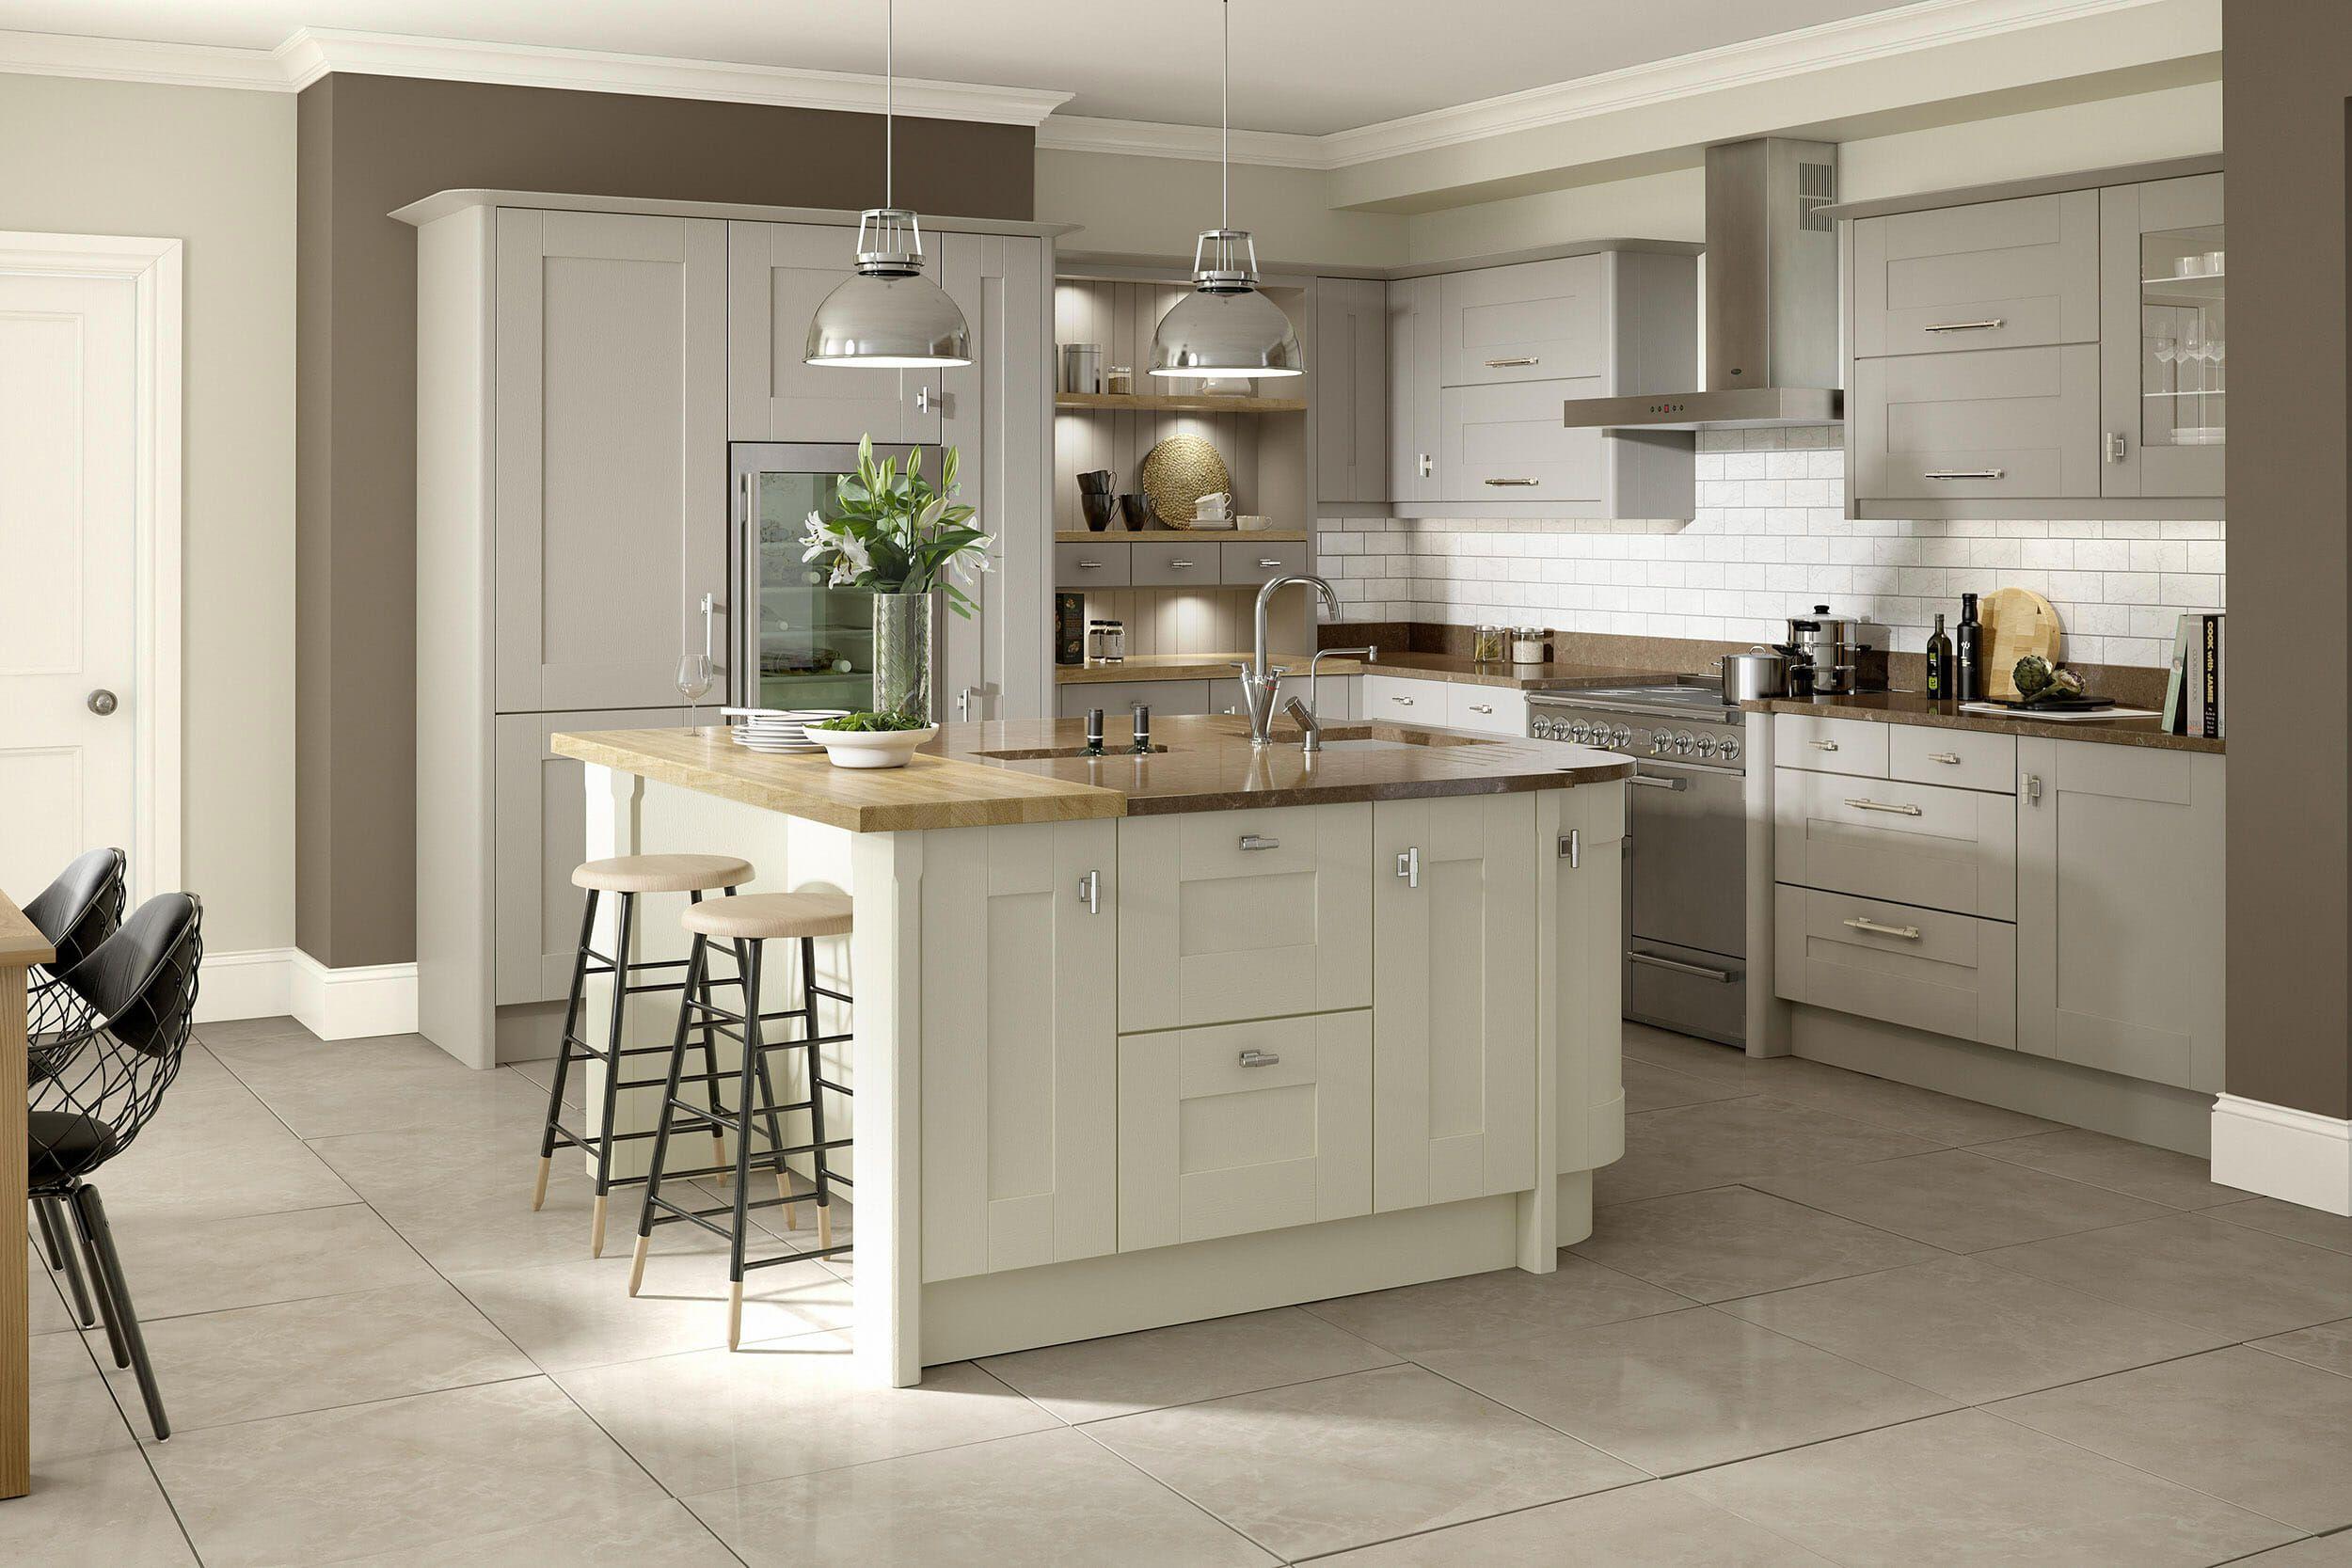 Fitted Kitchens Shrewsbury Mastercraft Kitchens Kitchen Fittings Kitchen Design Building Kitchen Cabinets